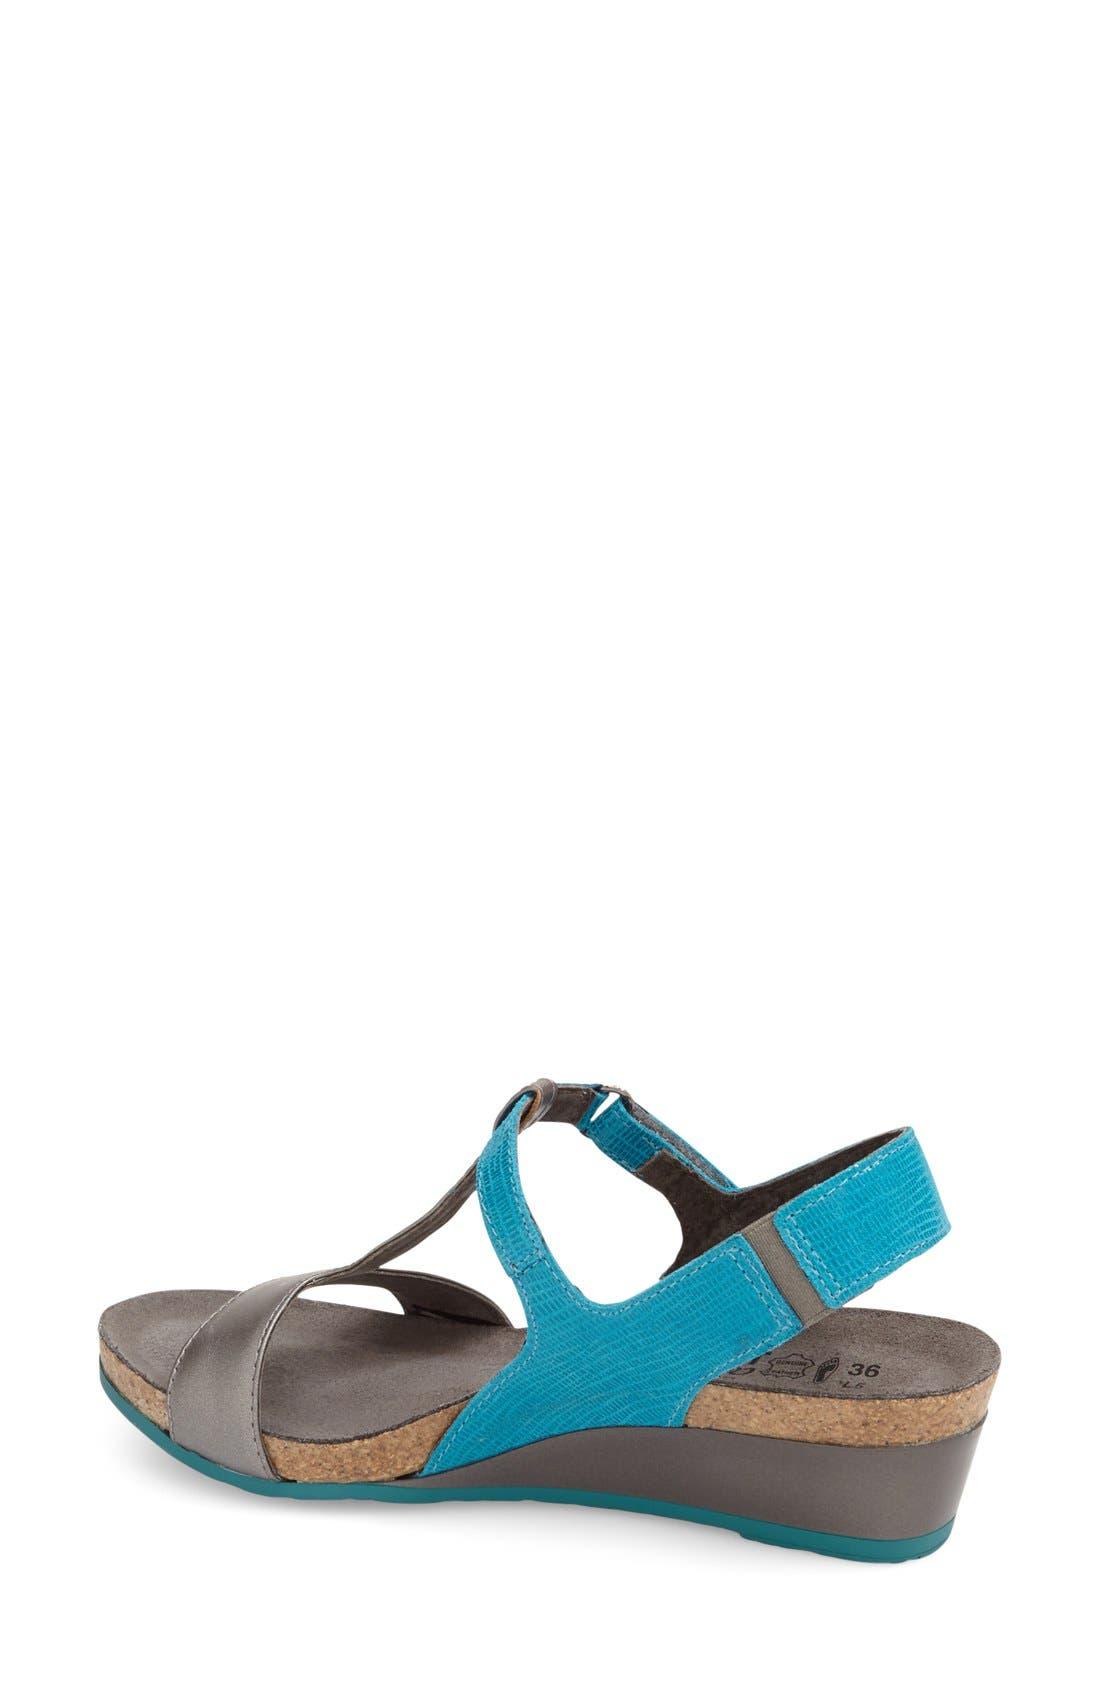 'Unicorn' T-Strap Sandal,                             Alternate thumbnail 2, color,                             AQUAMARINE LEATHER